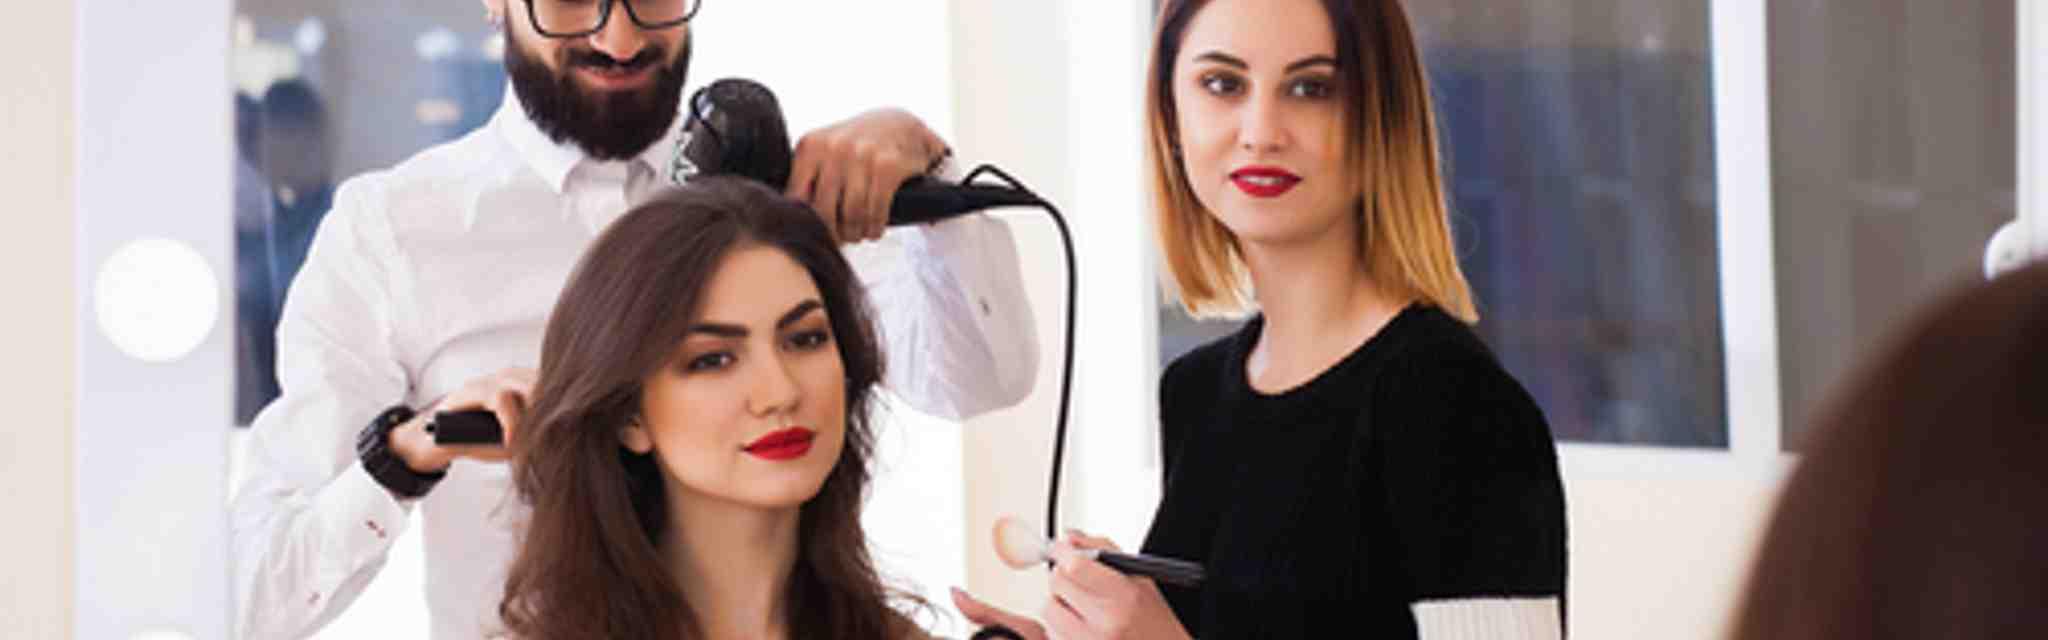 Tips Kelola Gaji Karyawan Salon dan Klinik Kecantikan, Xperience Team